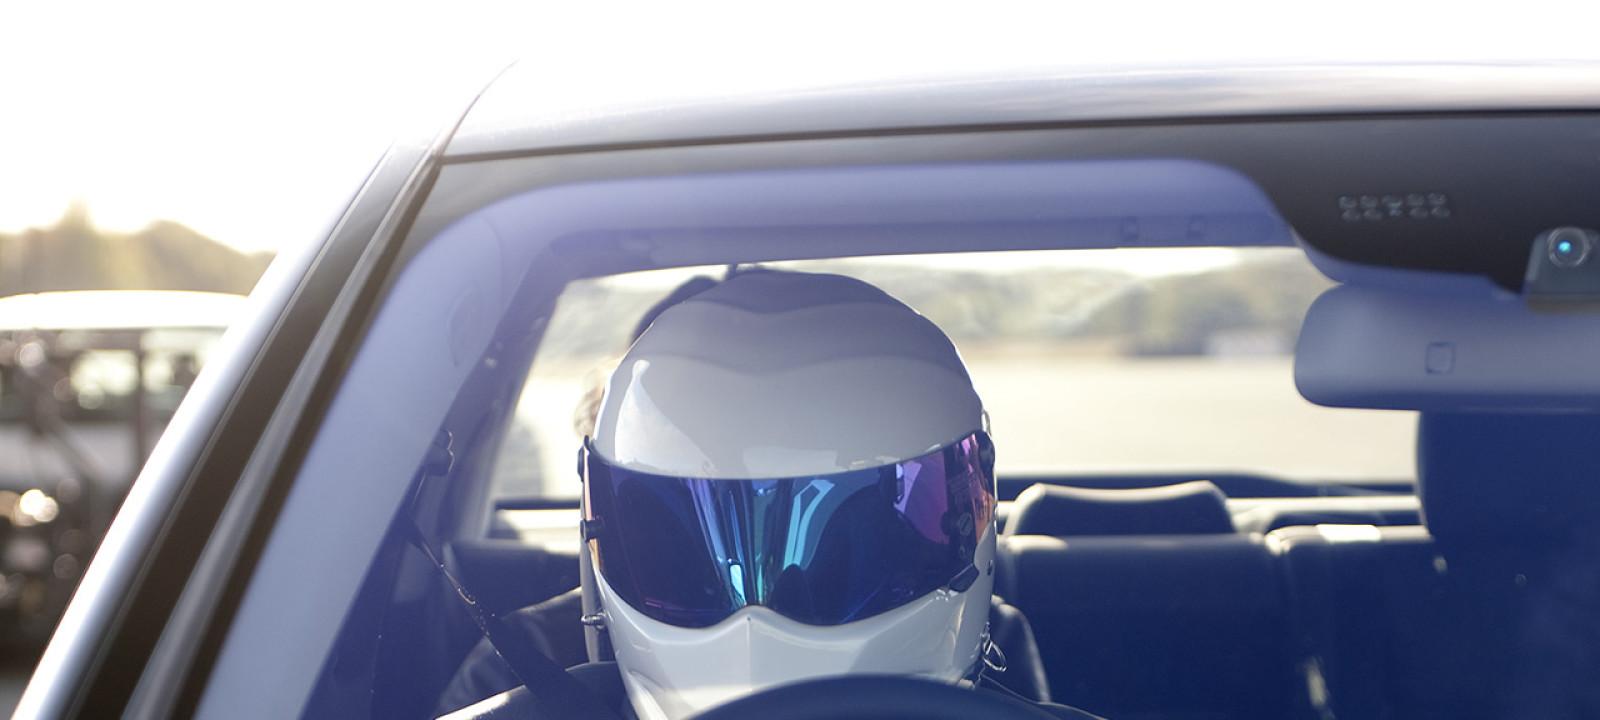 The Stig must slowly in the BMW 760Li